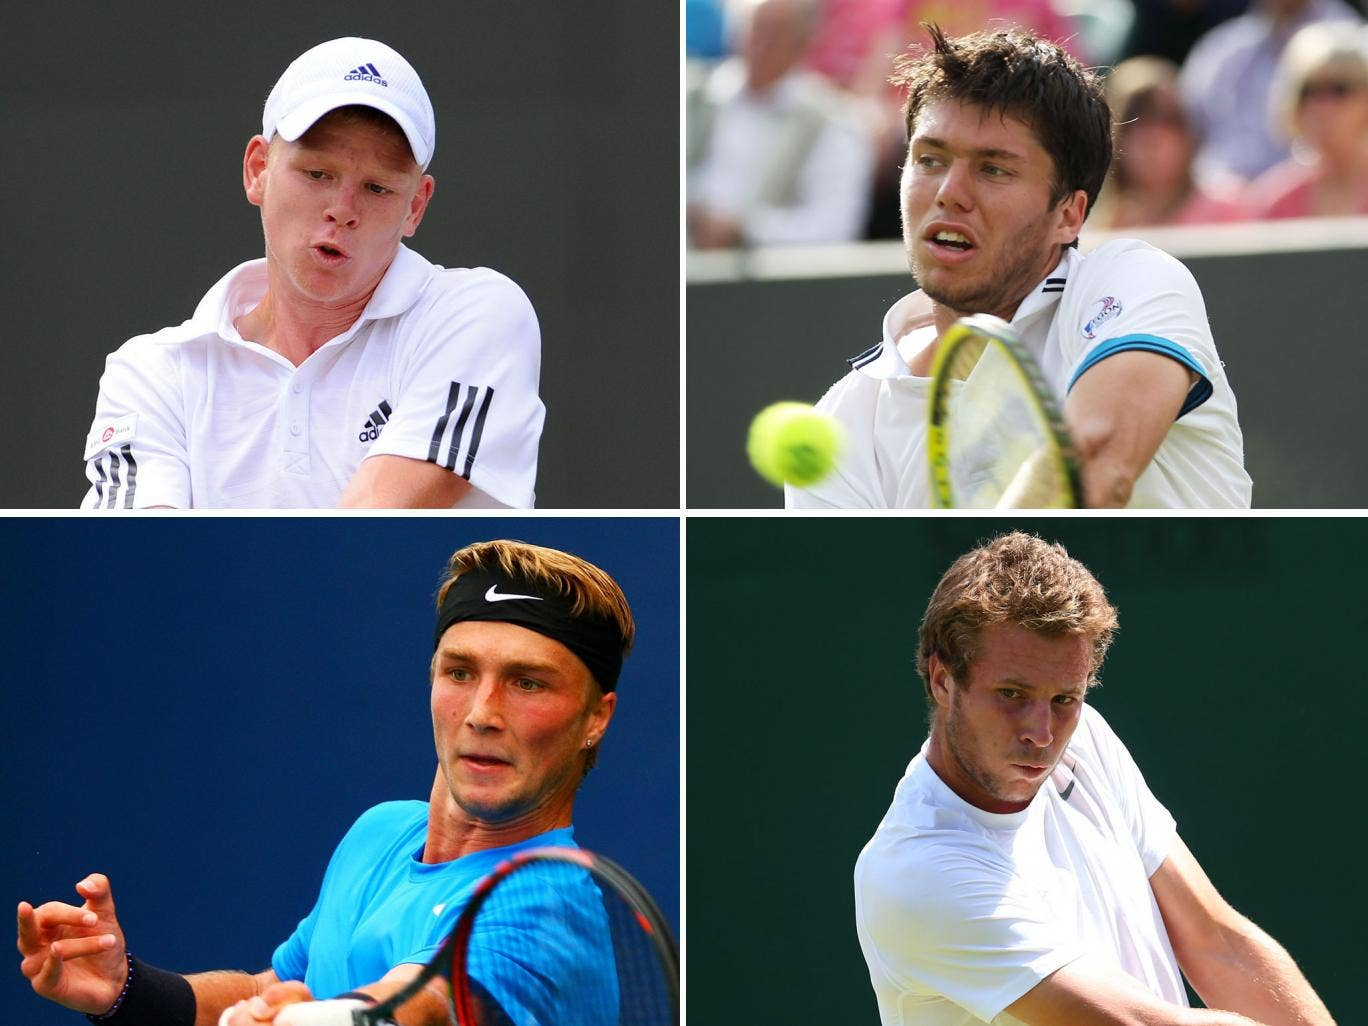 Clockwise from top left: Kyle Edmund, Oliver Golding, Luke Bambridge and Liam Broady